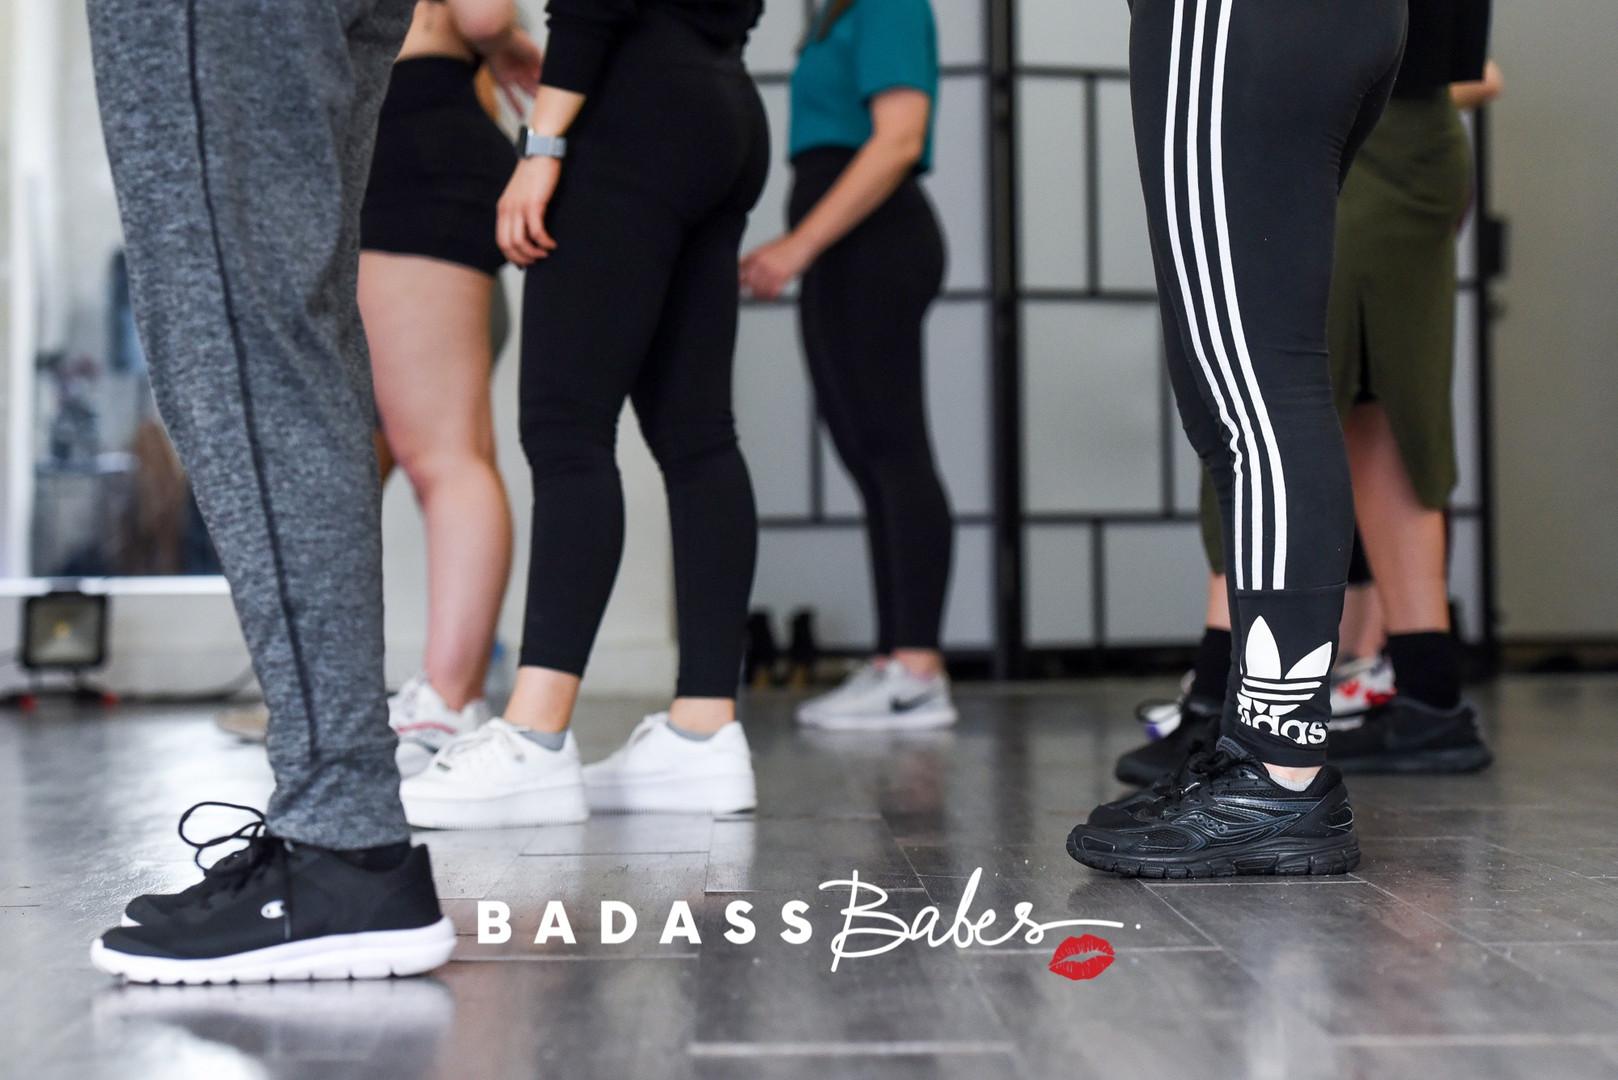 20200112 - Badass Babes - Captive Camera